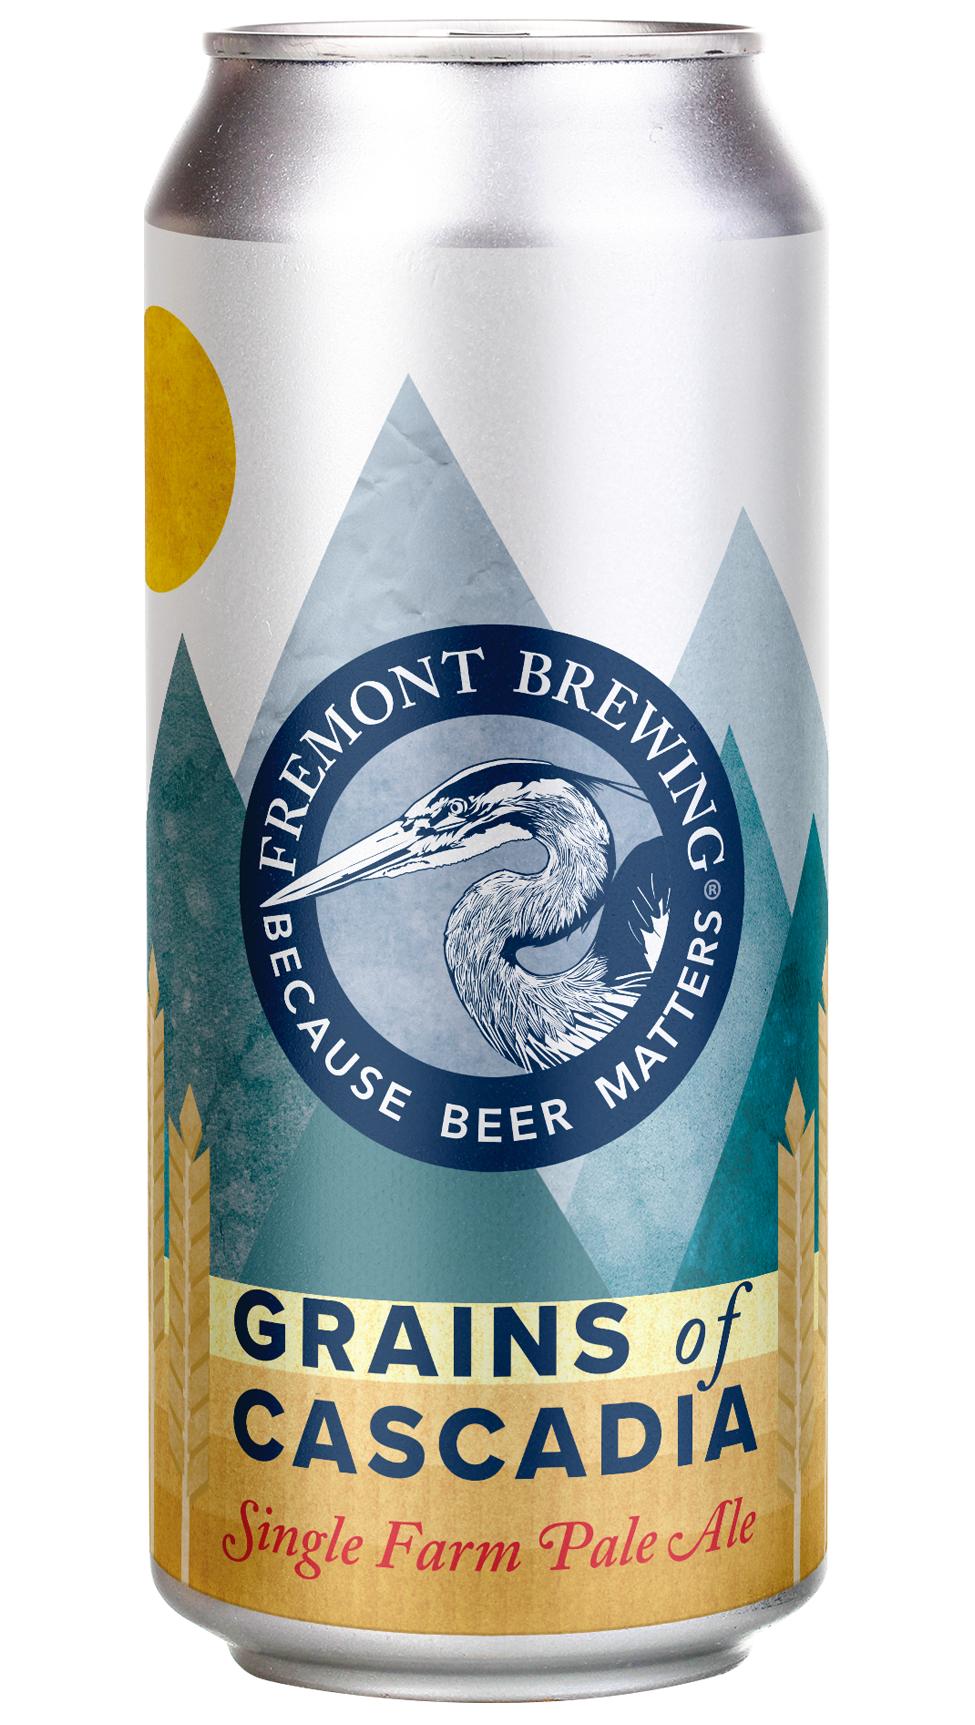 Grains of Cascadia